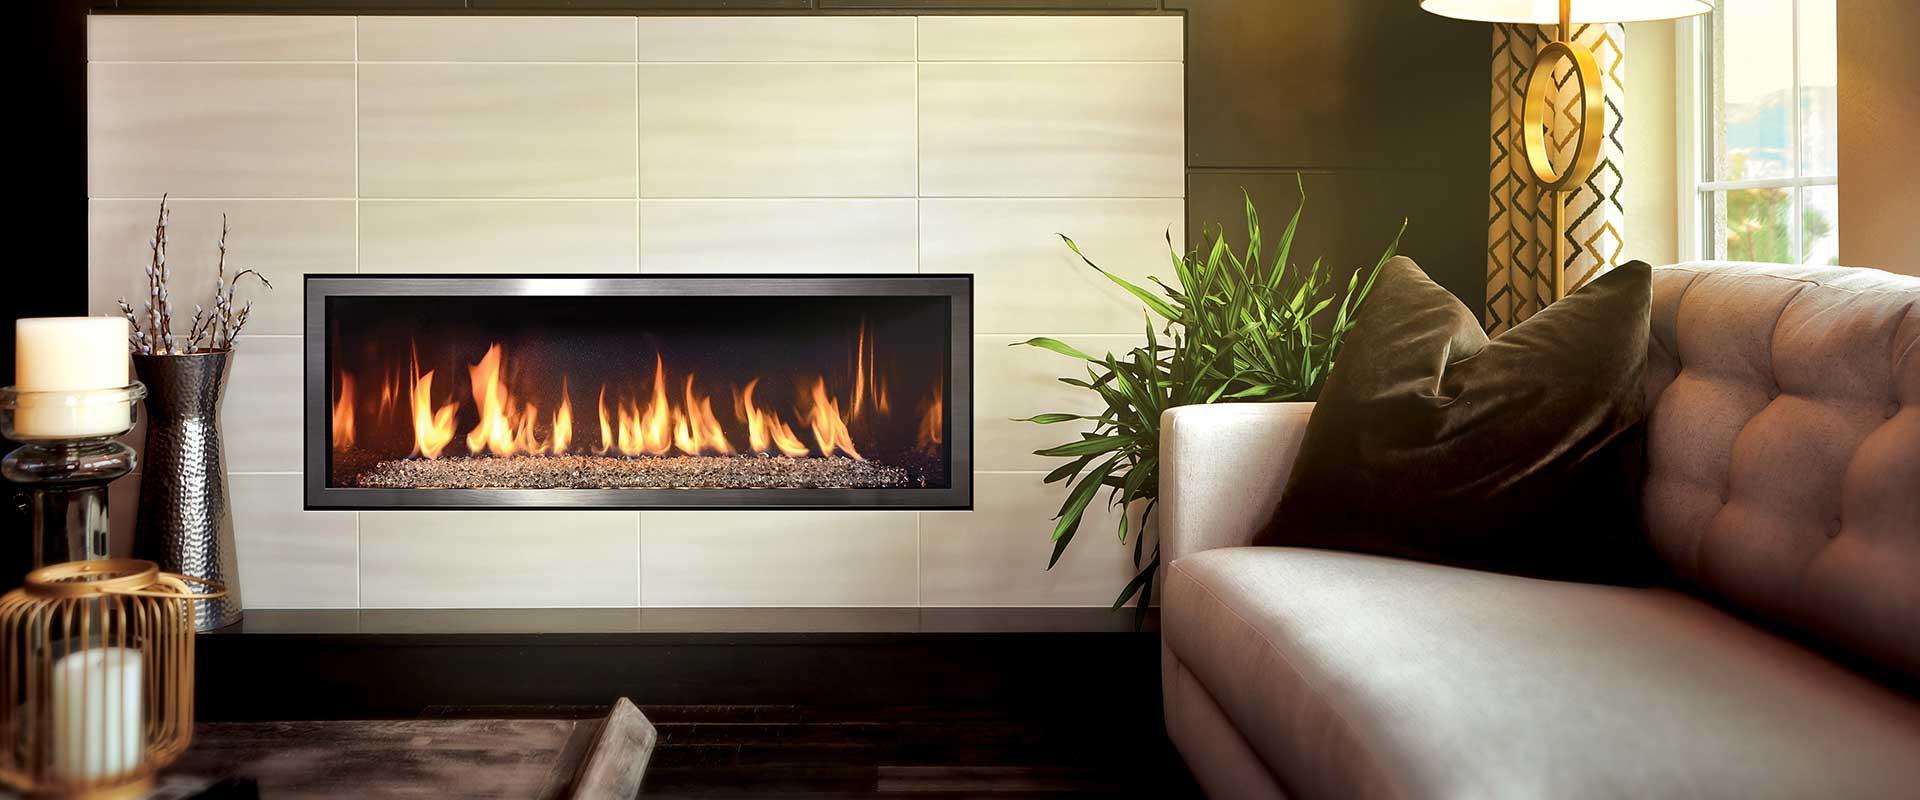 firepalce-installation